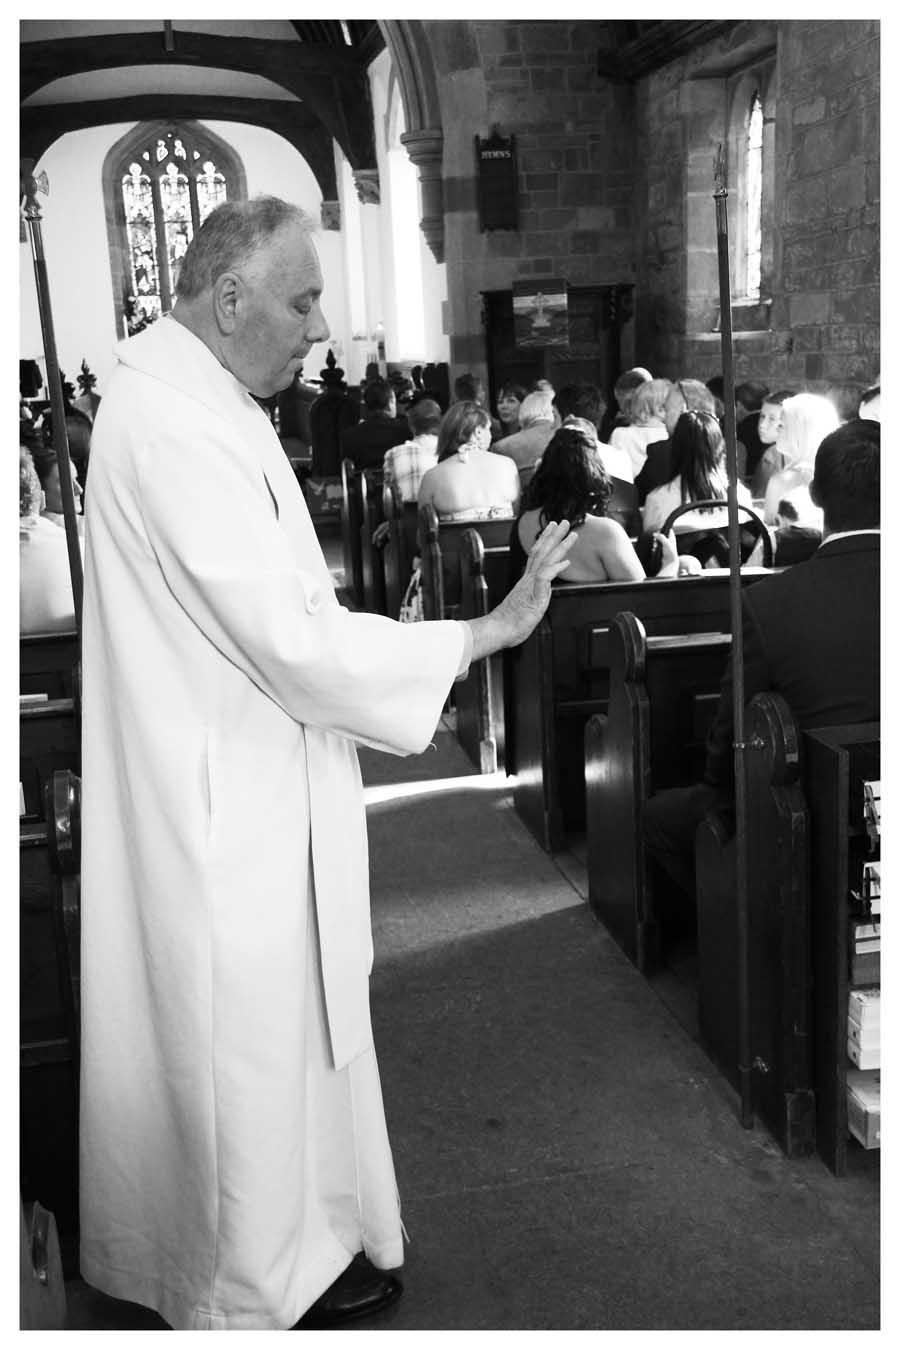 CHURCH ARRIVAL Photo by Simeon Thaw Copyright  2015 (14).jpg